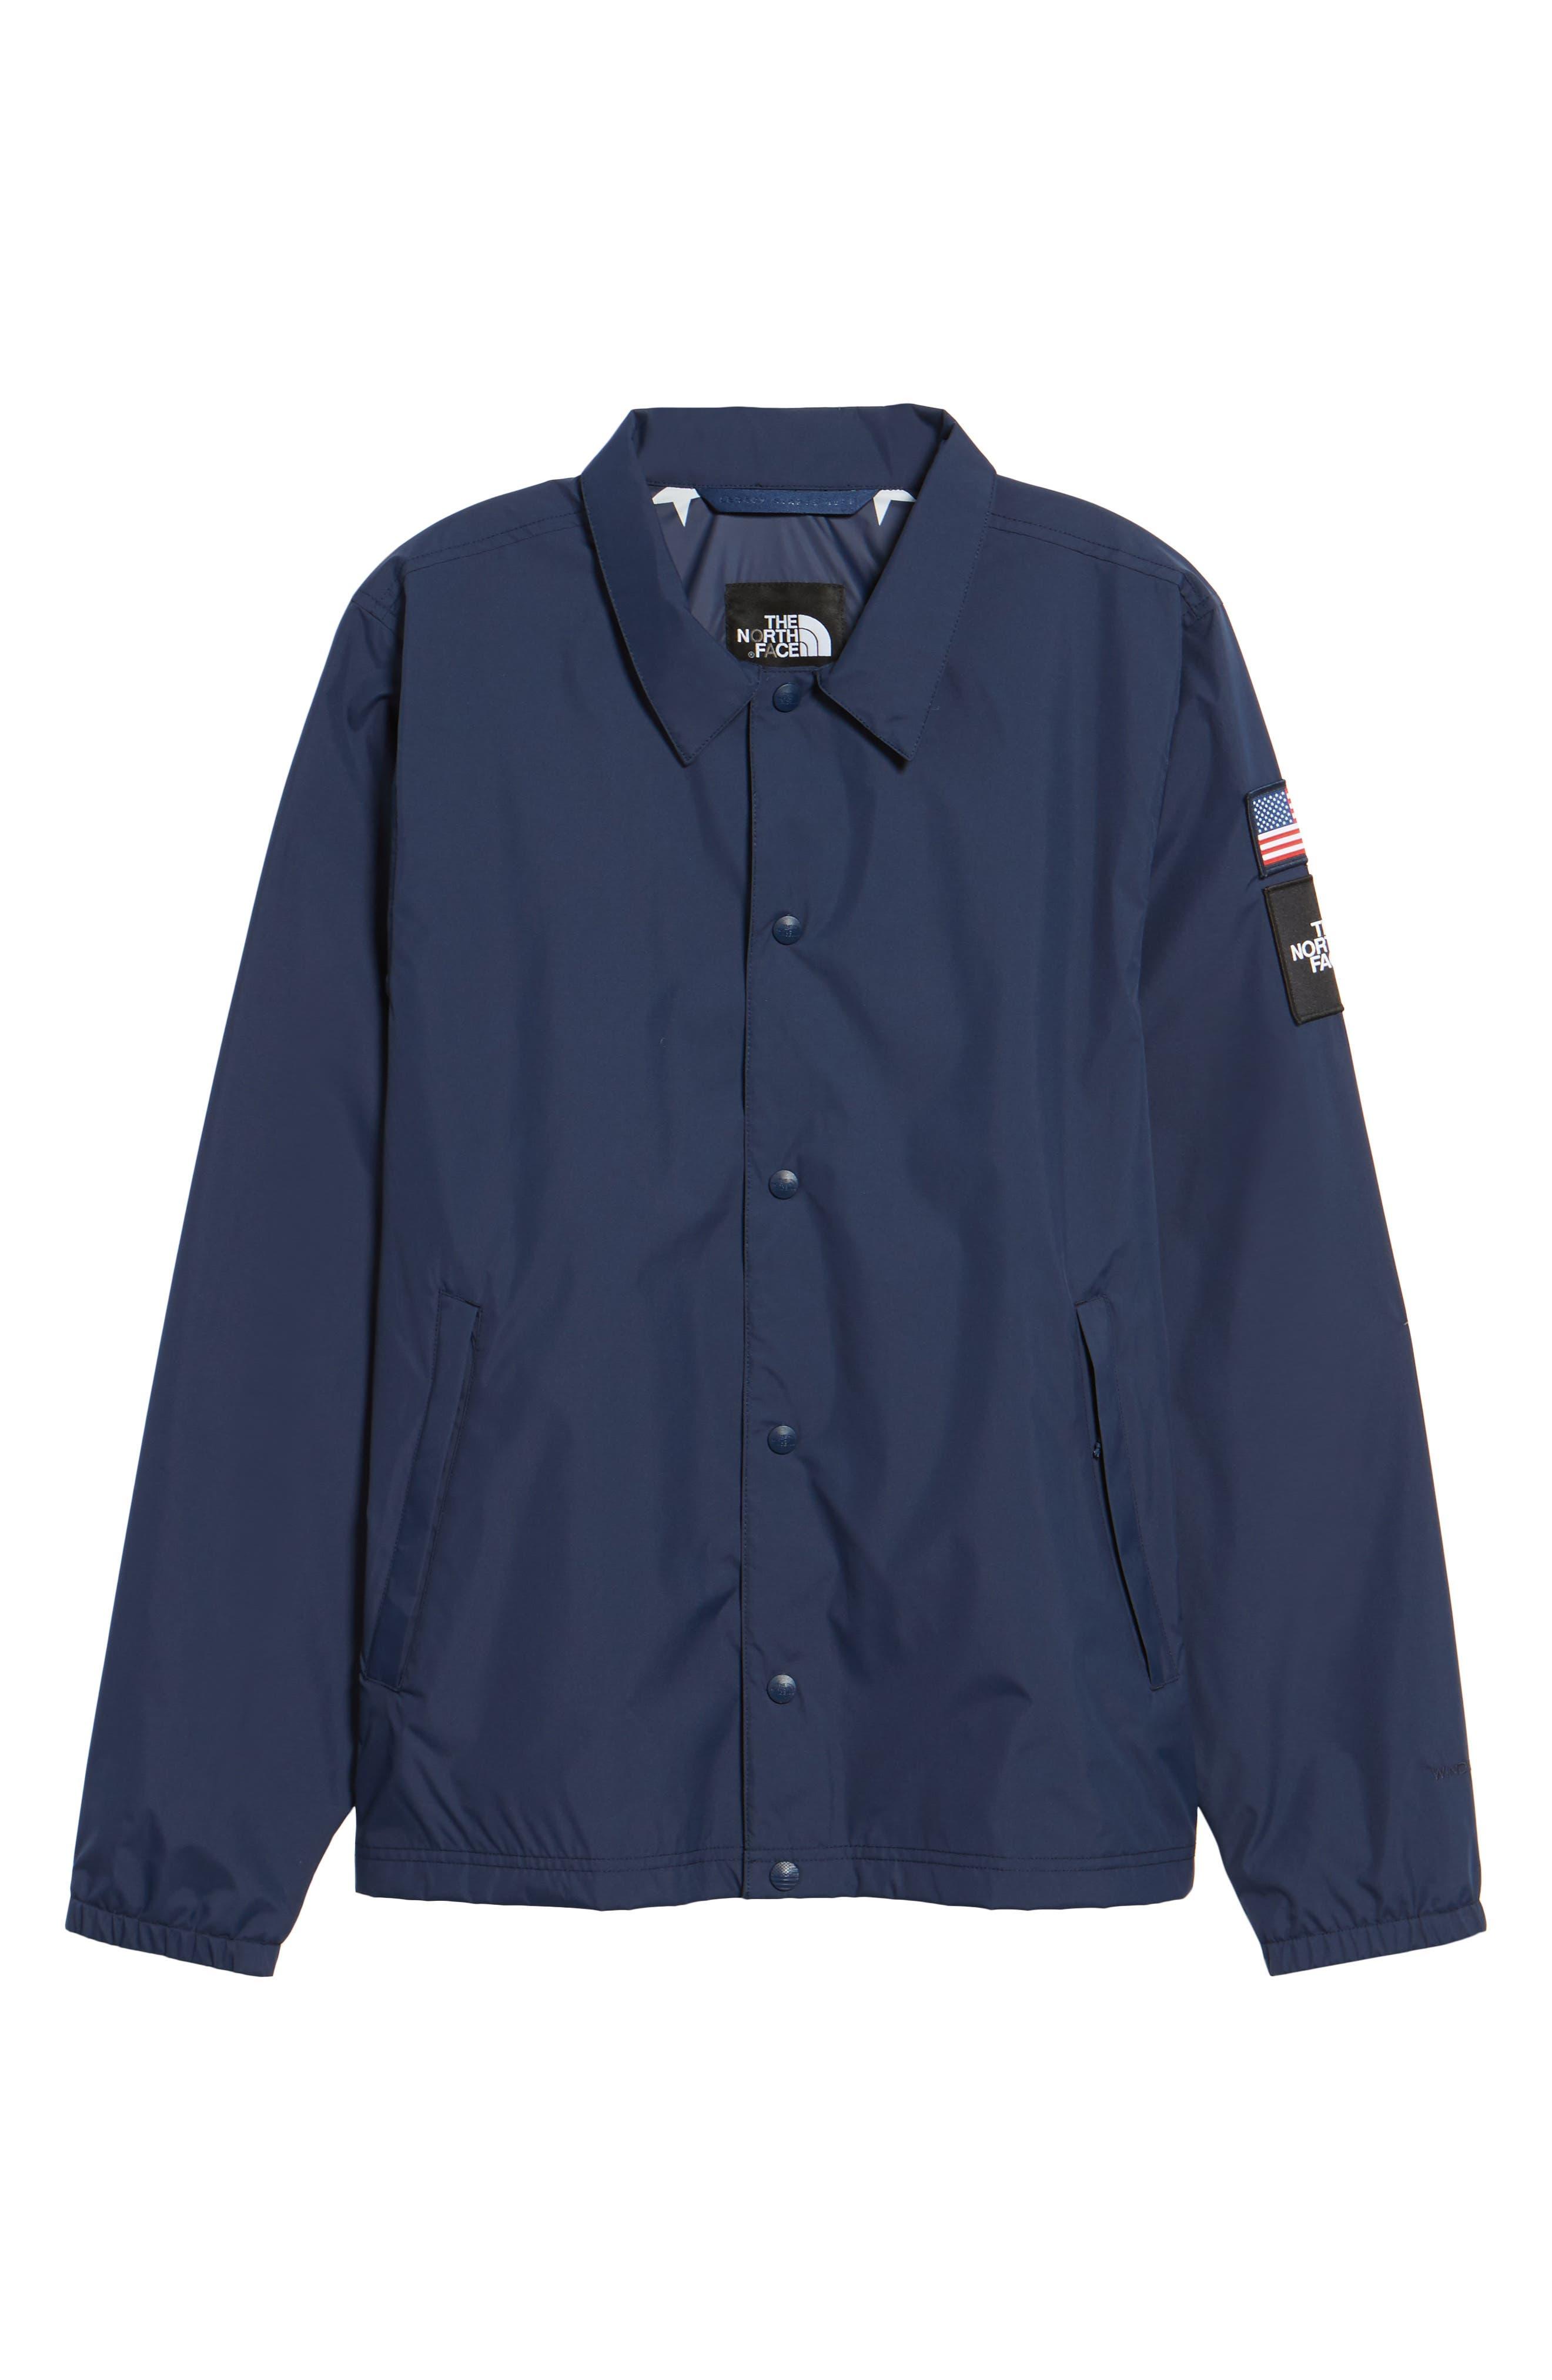 International Collection Coach Jacket,                             Alternate thumbnail 15, color,